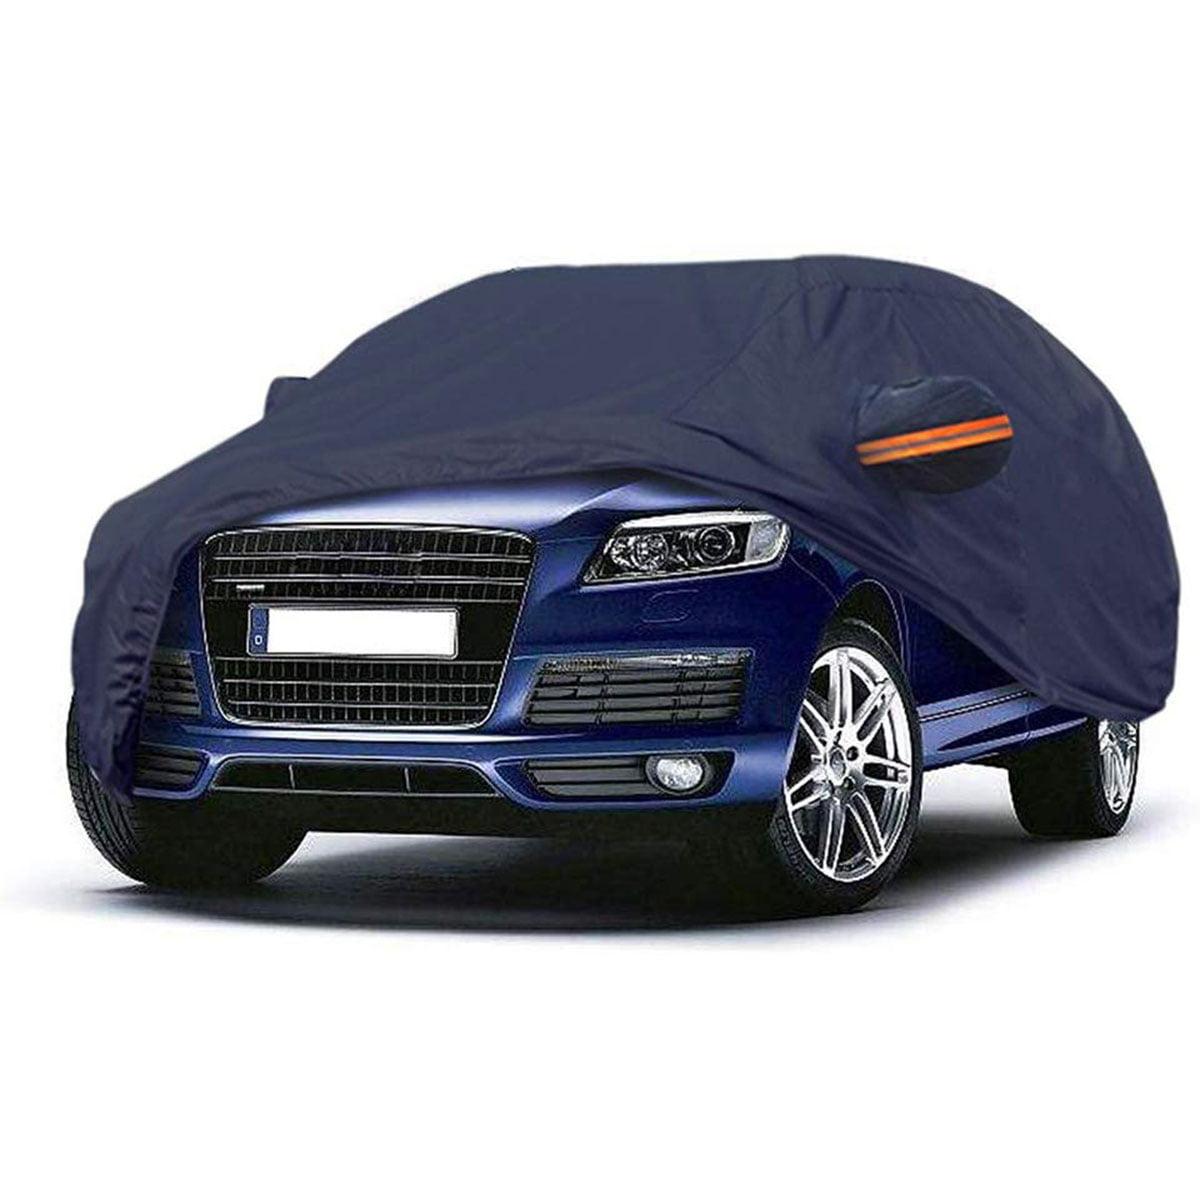 BUICK LACROSSE 2010-2016 CAR COVER 100/% Waterproof 100/% Breathable